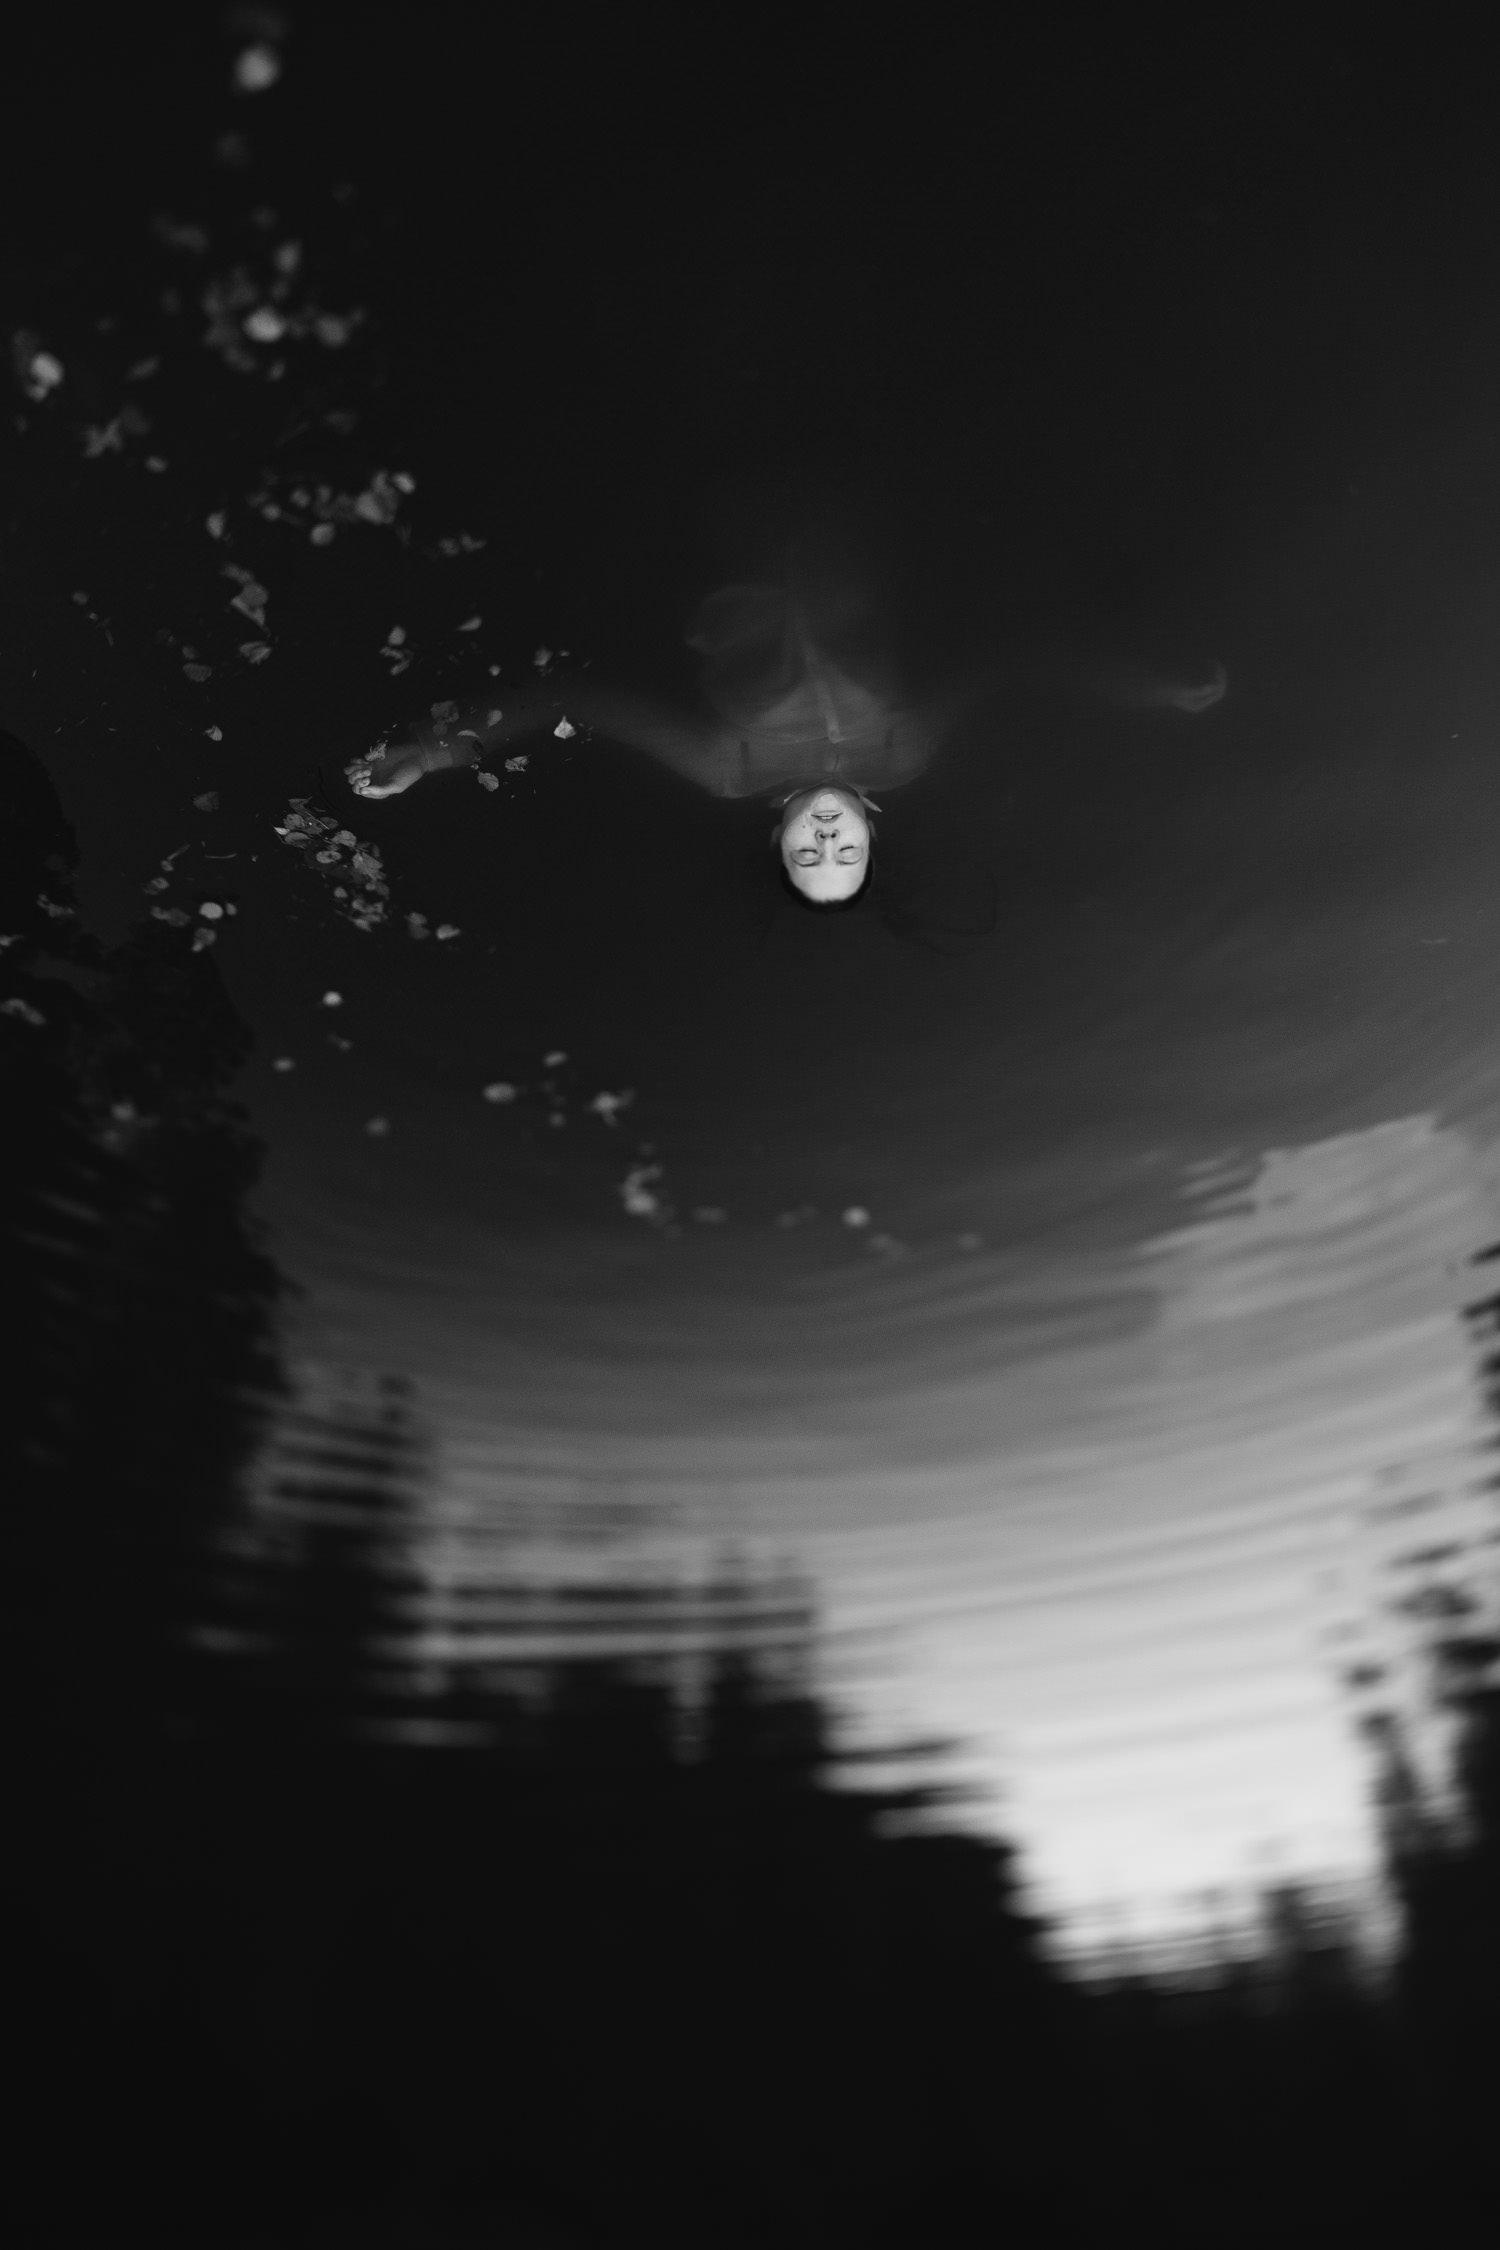 Linos portretas ežere